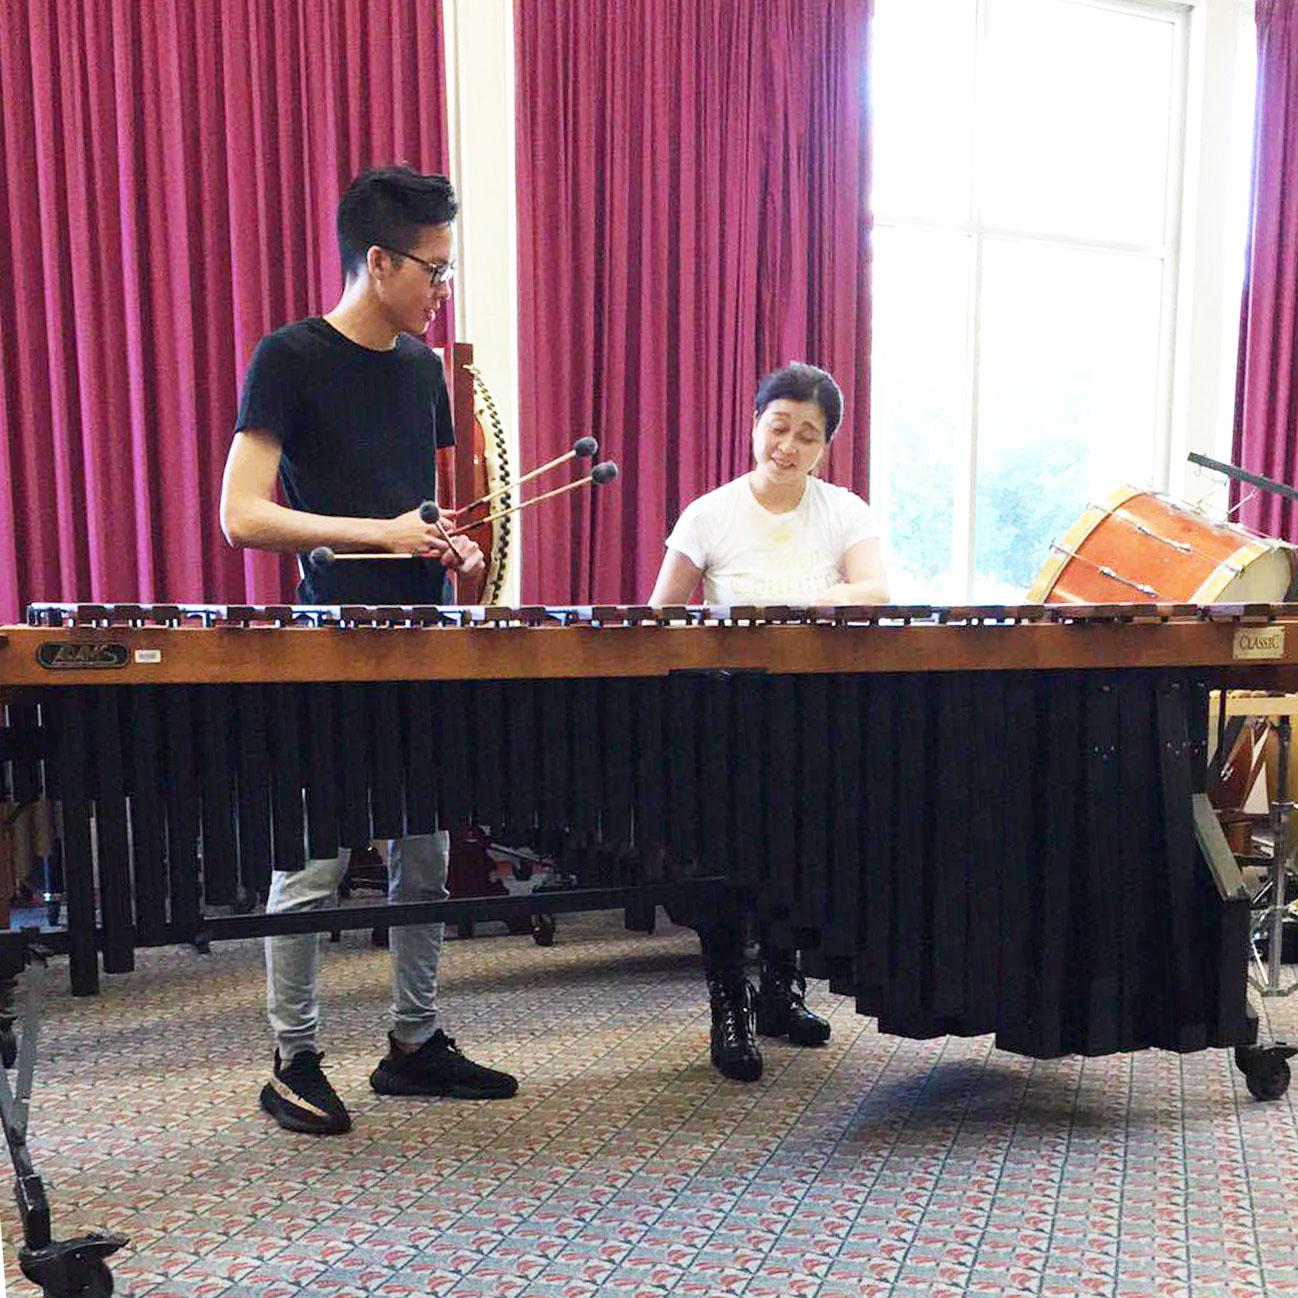 Kuniko Kato Masterclass at WAAPA